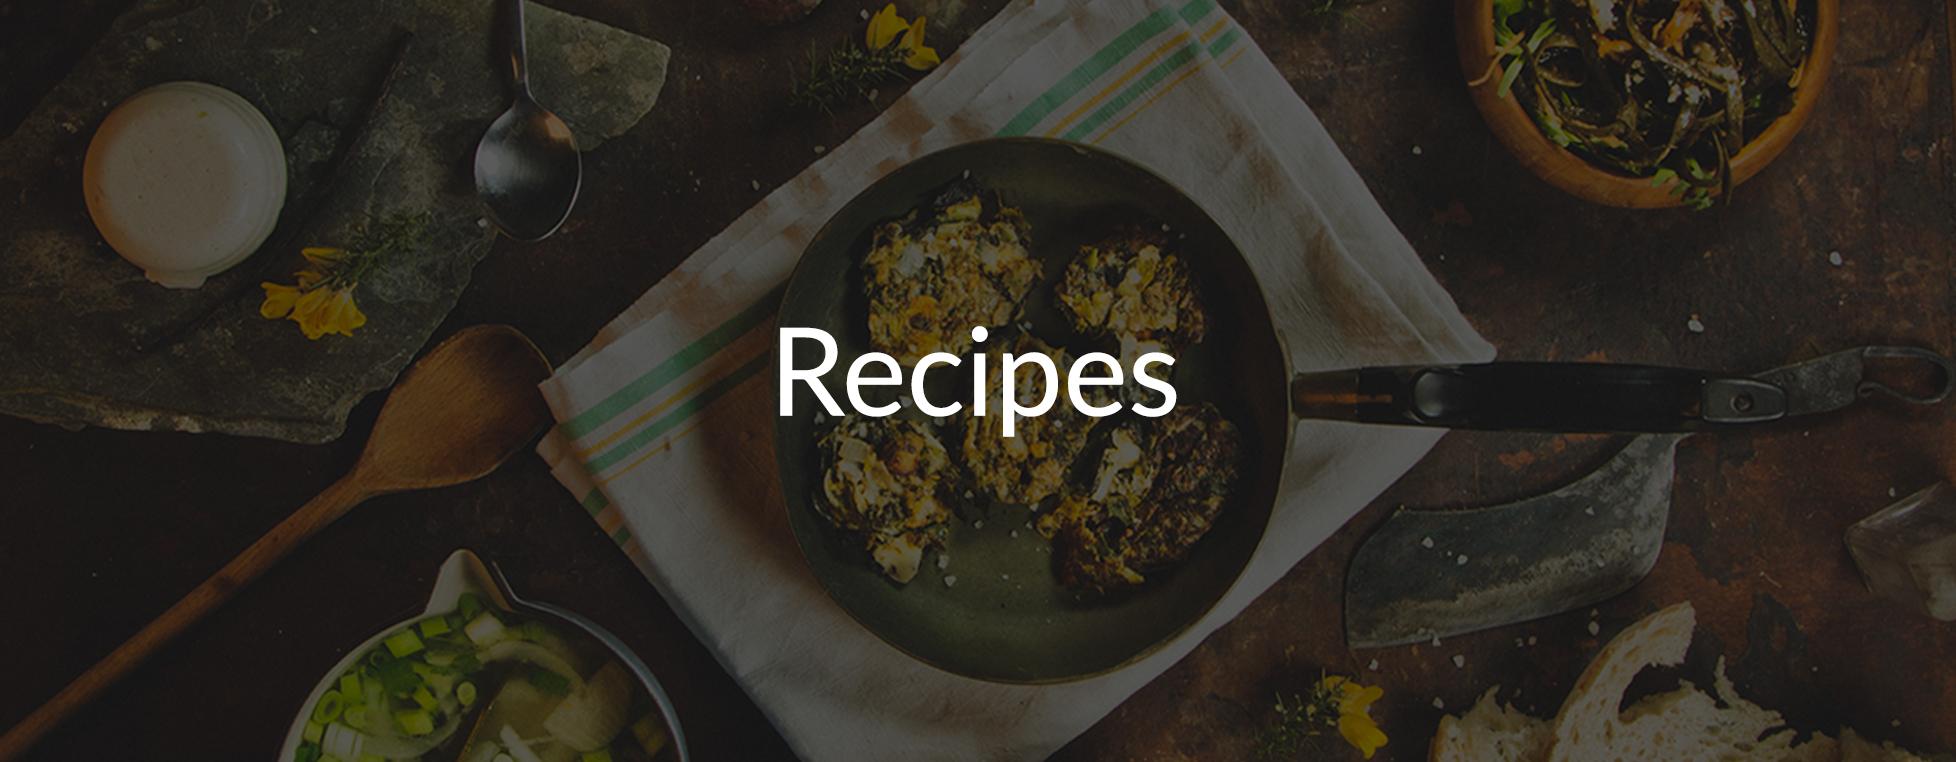 recipes-over